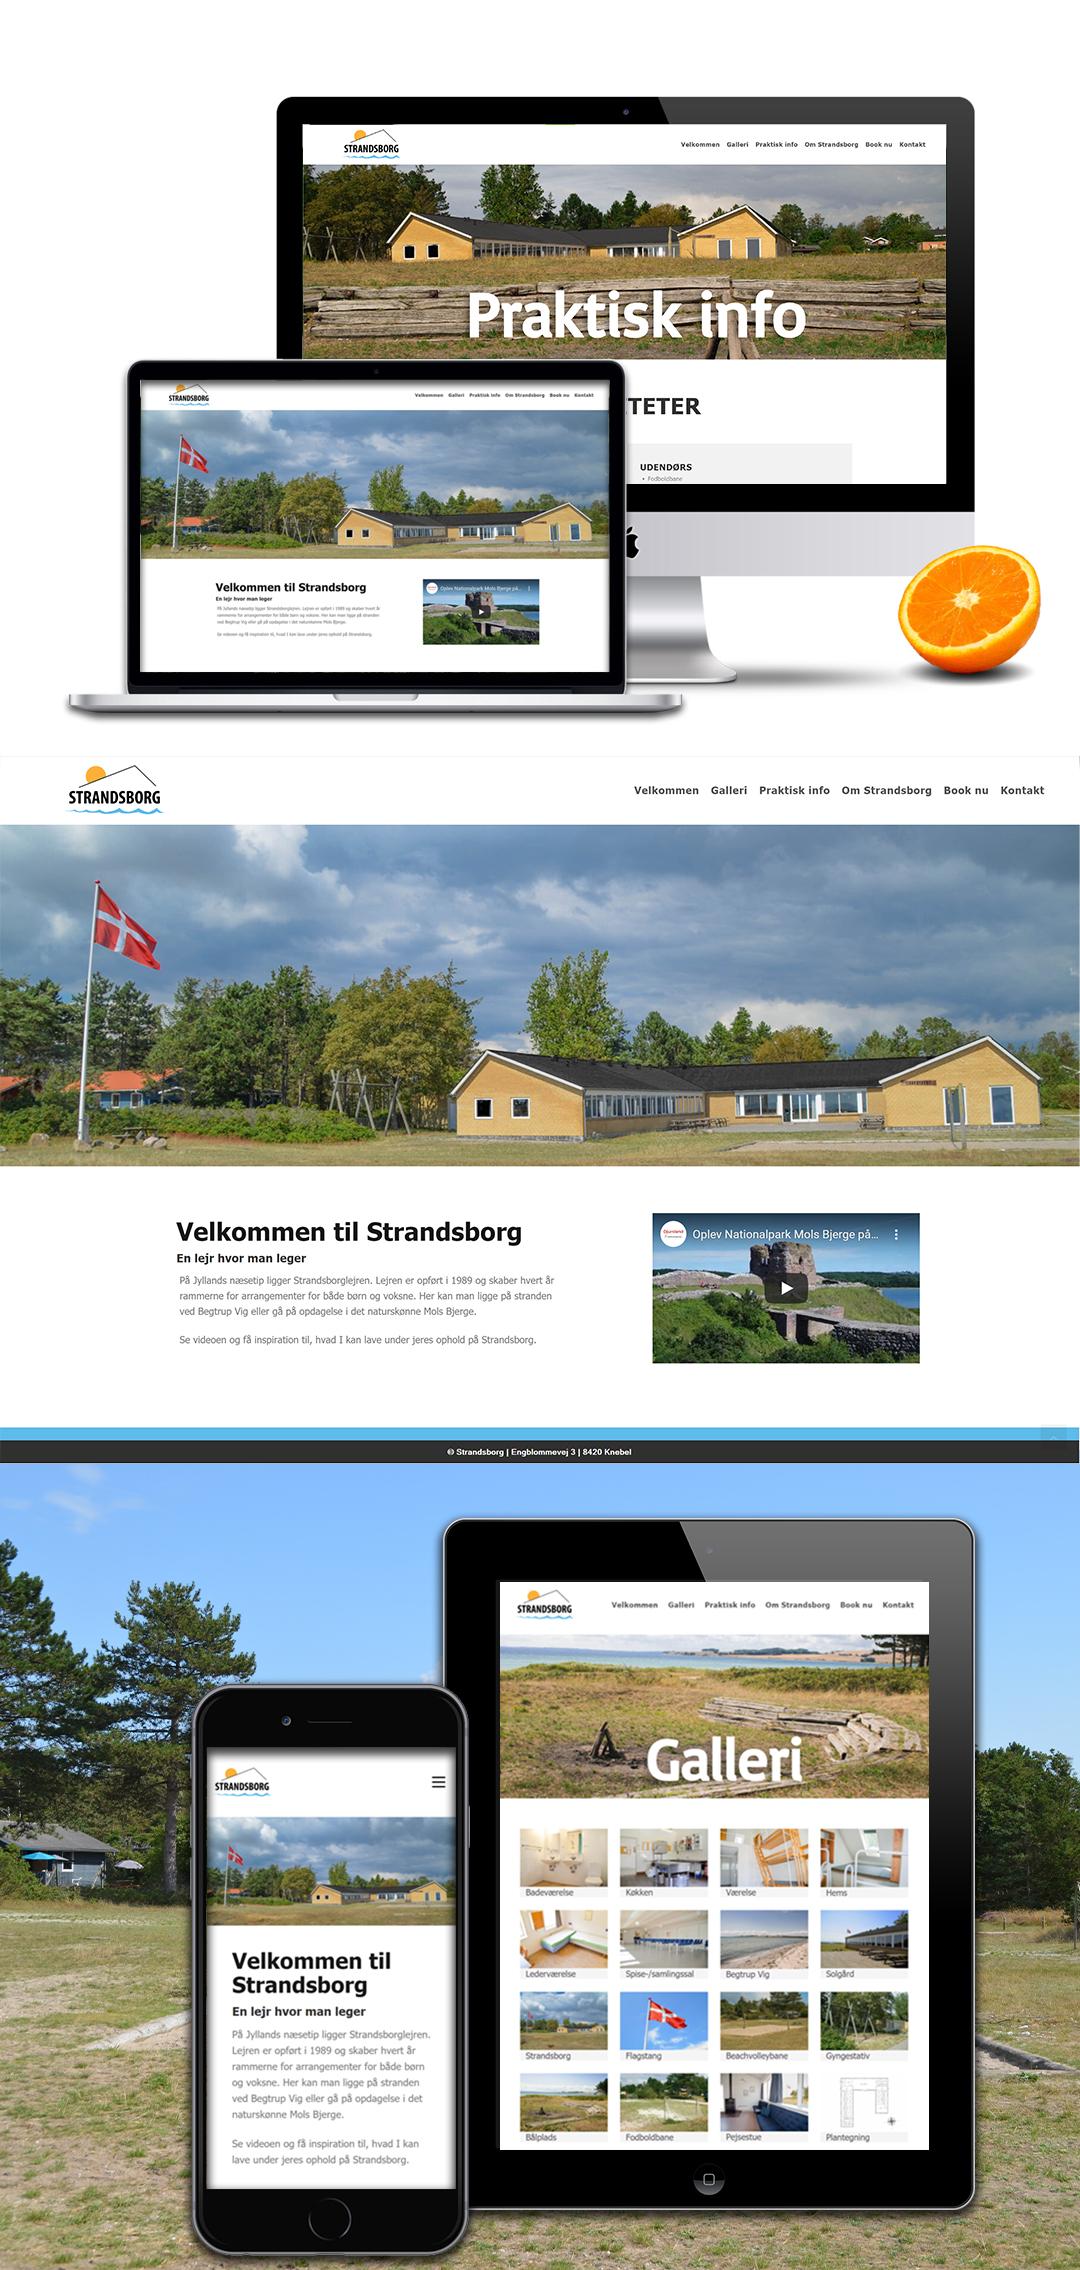 whyorange-strandsborg-case